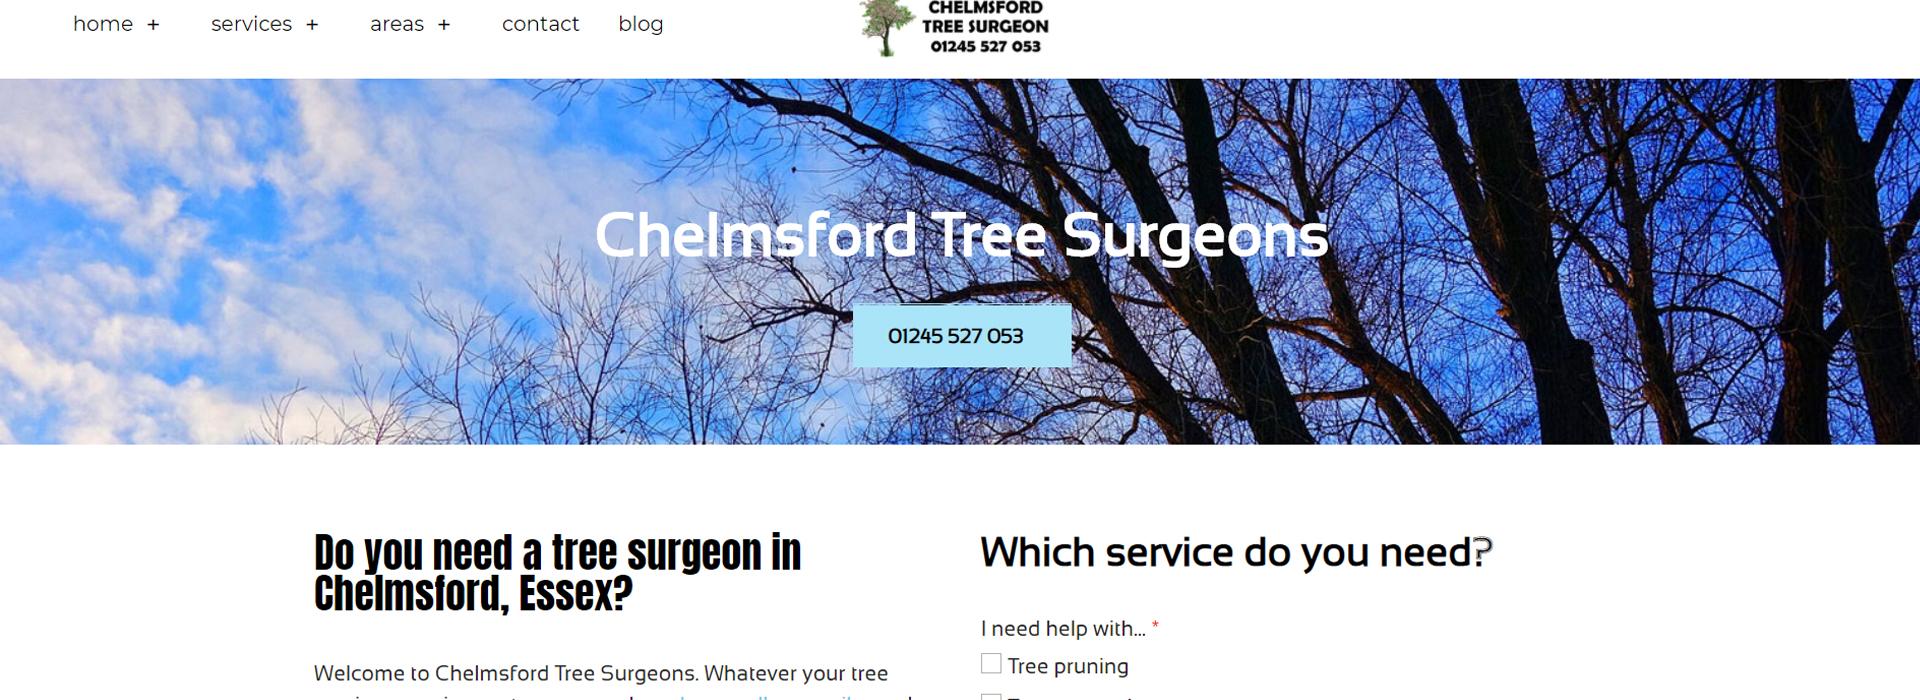 chelmsford tree surgeon